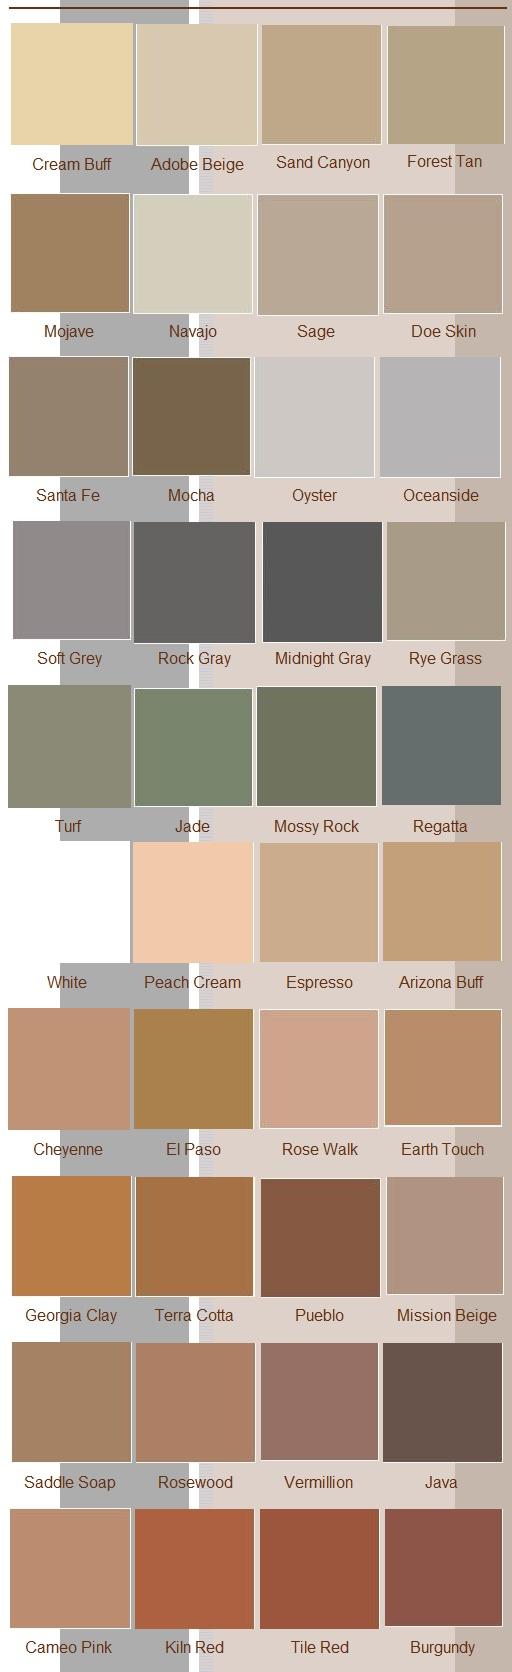 165 best rugs and floor images on Pinterest   Floor decor, Tile ...